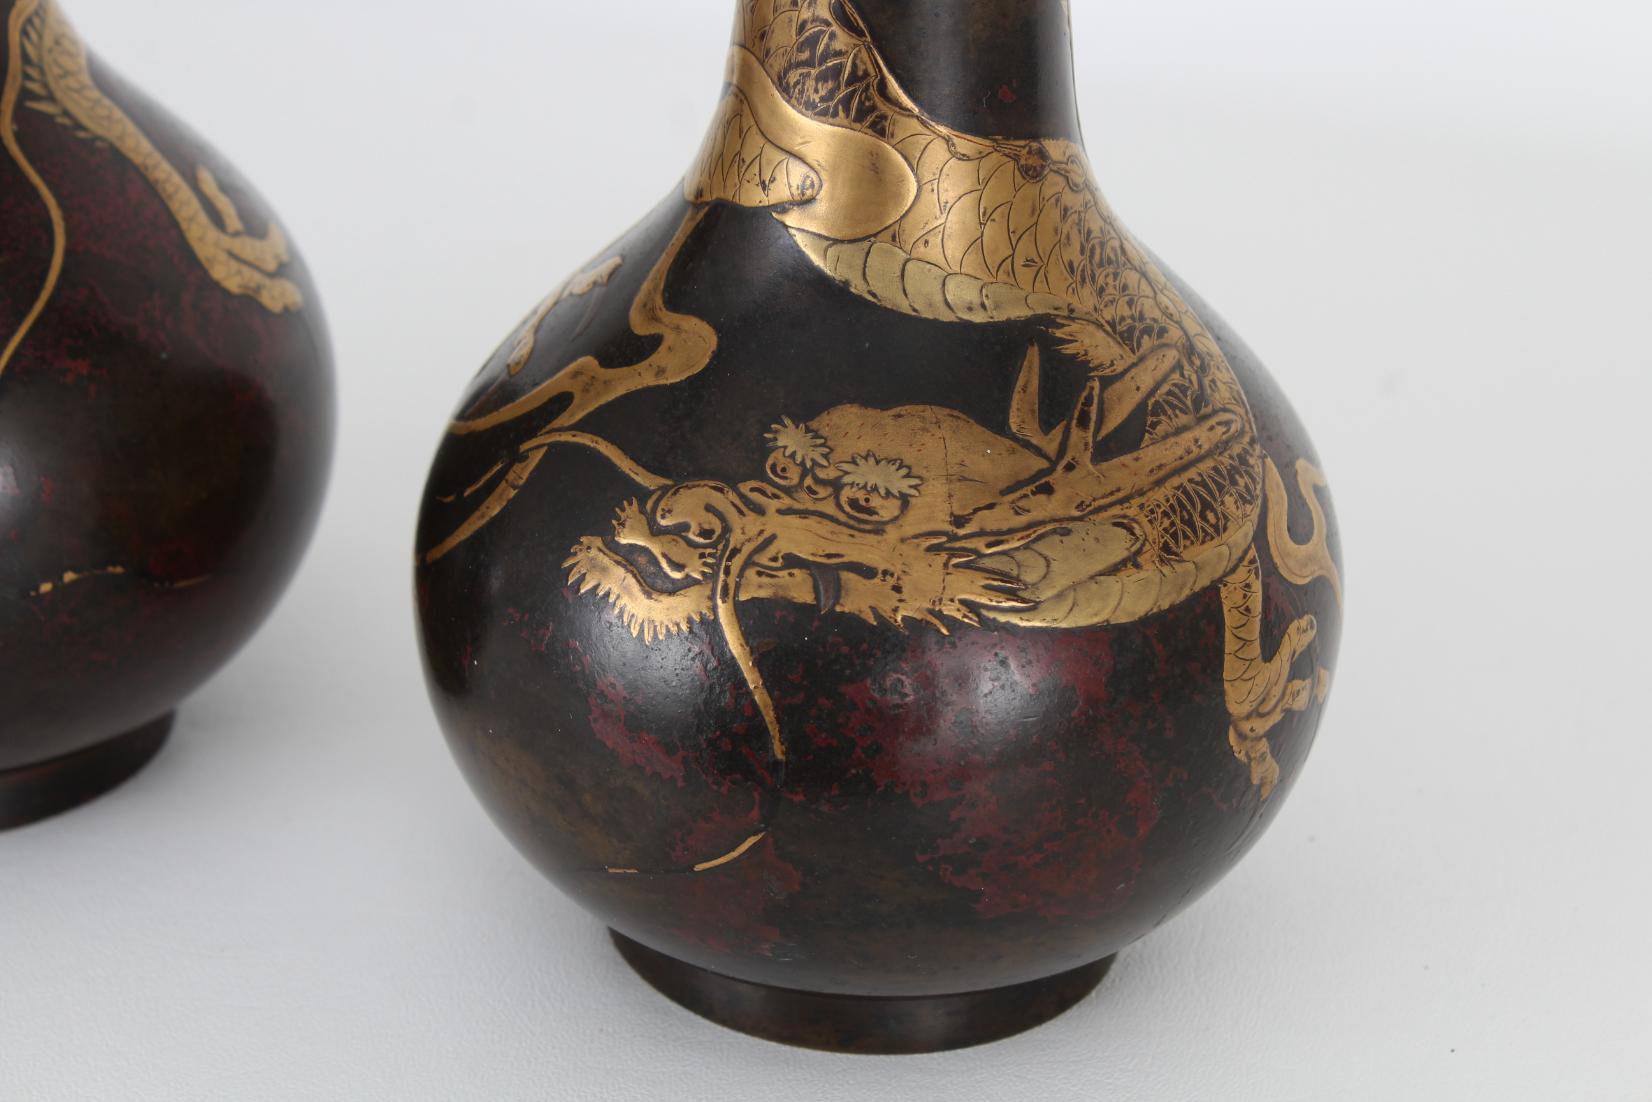 (2) Antique Bronze/Gold Japanese Dragon Vases - Image 3 of 7